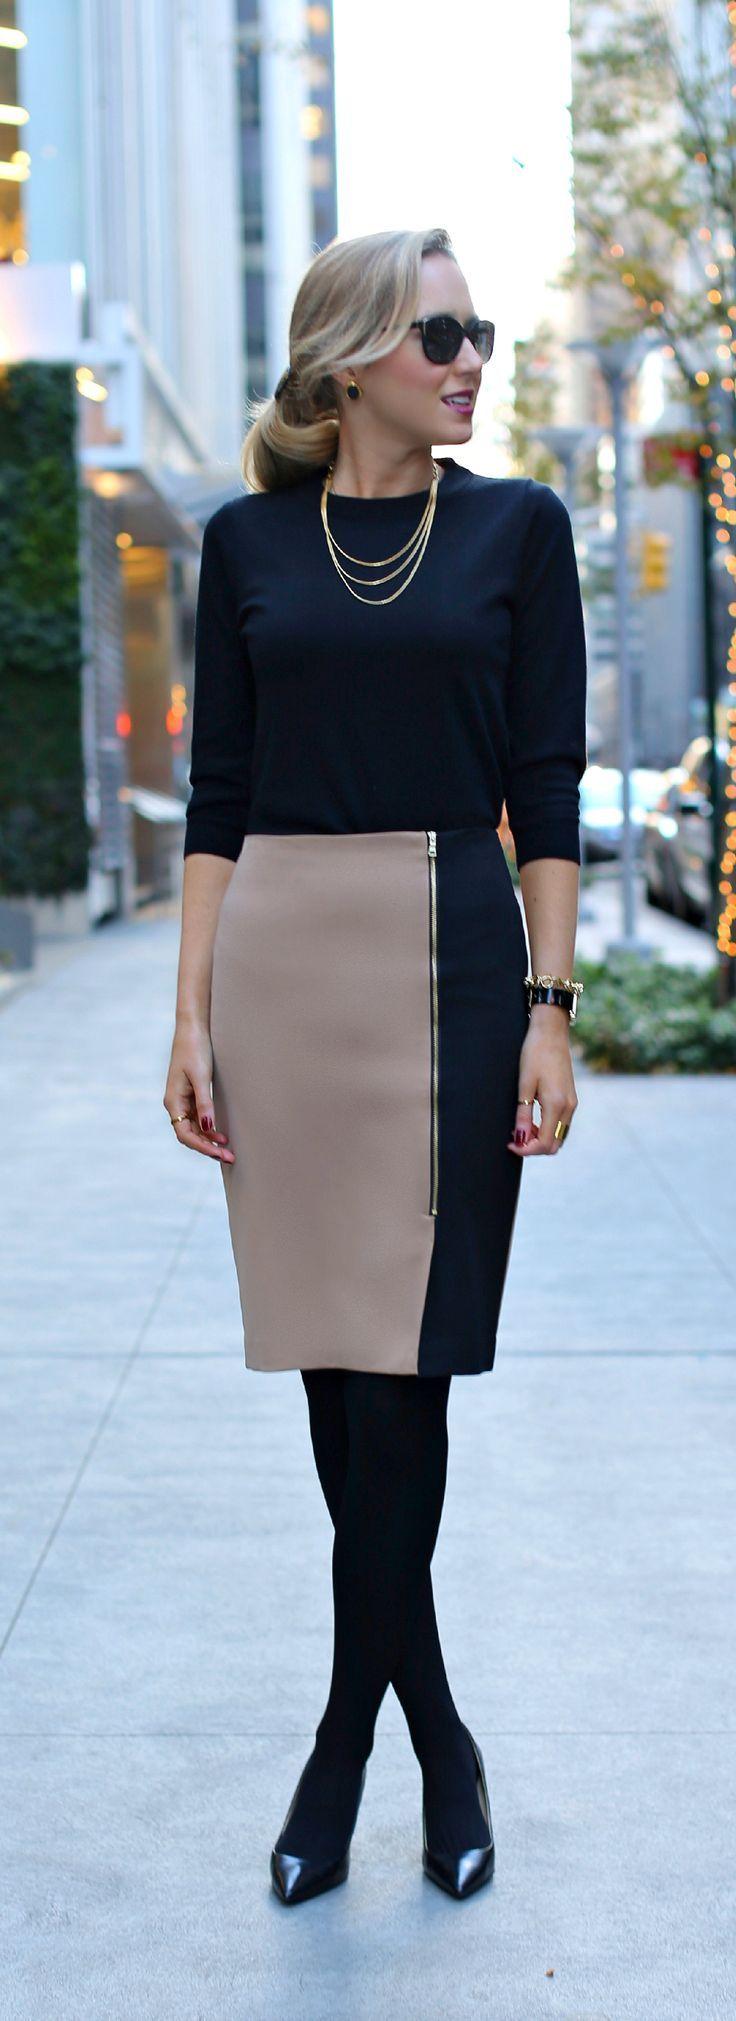 04425dcb6b6 Classy all black office attire.